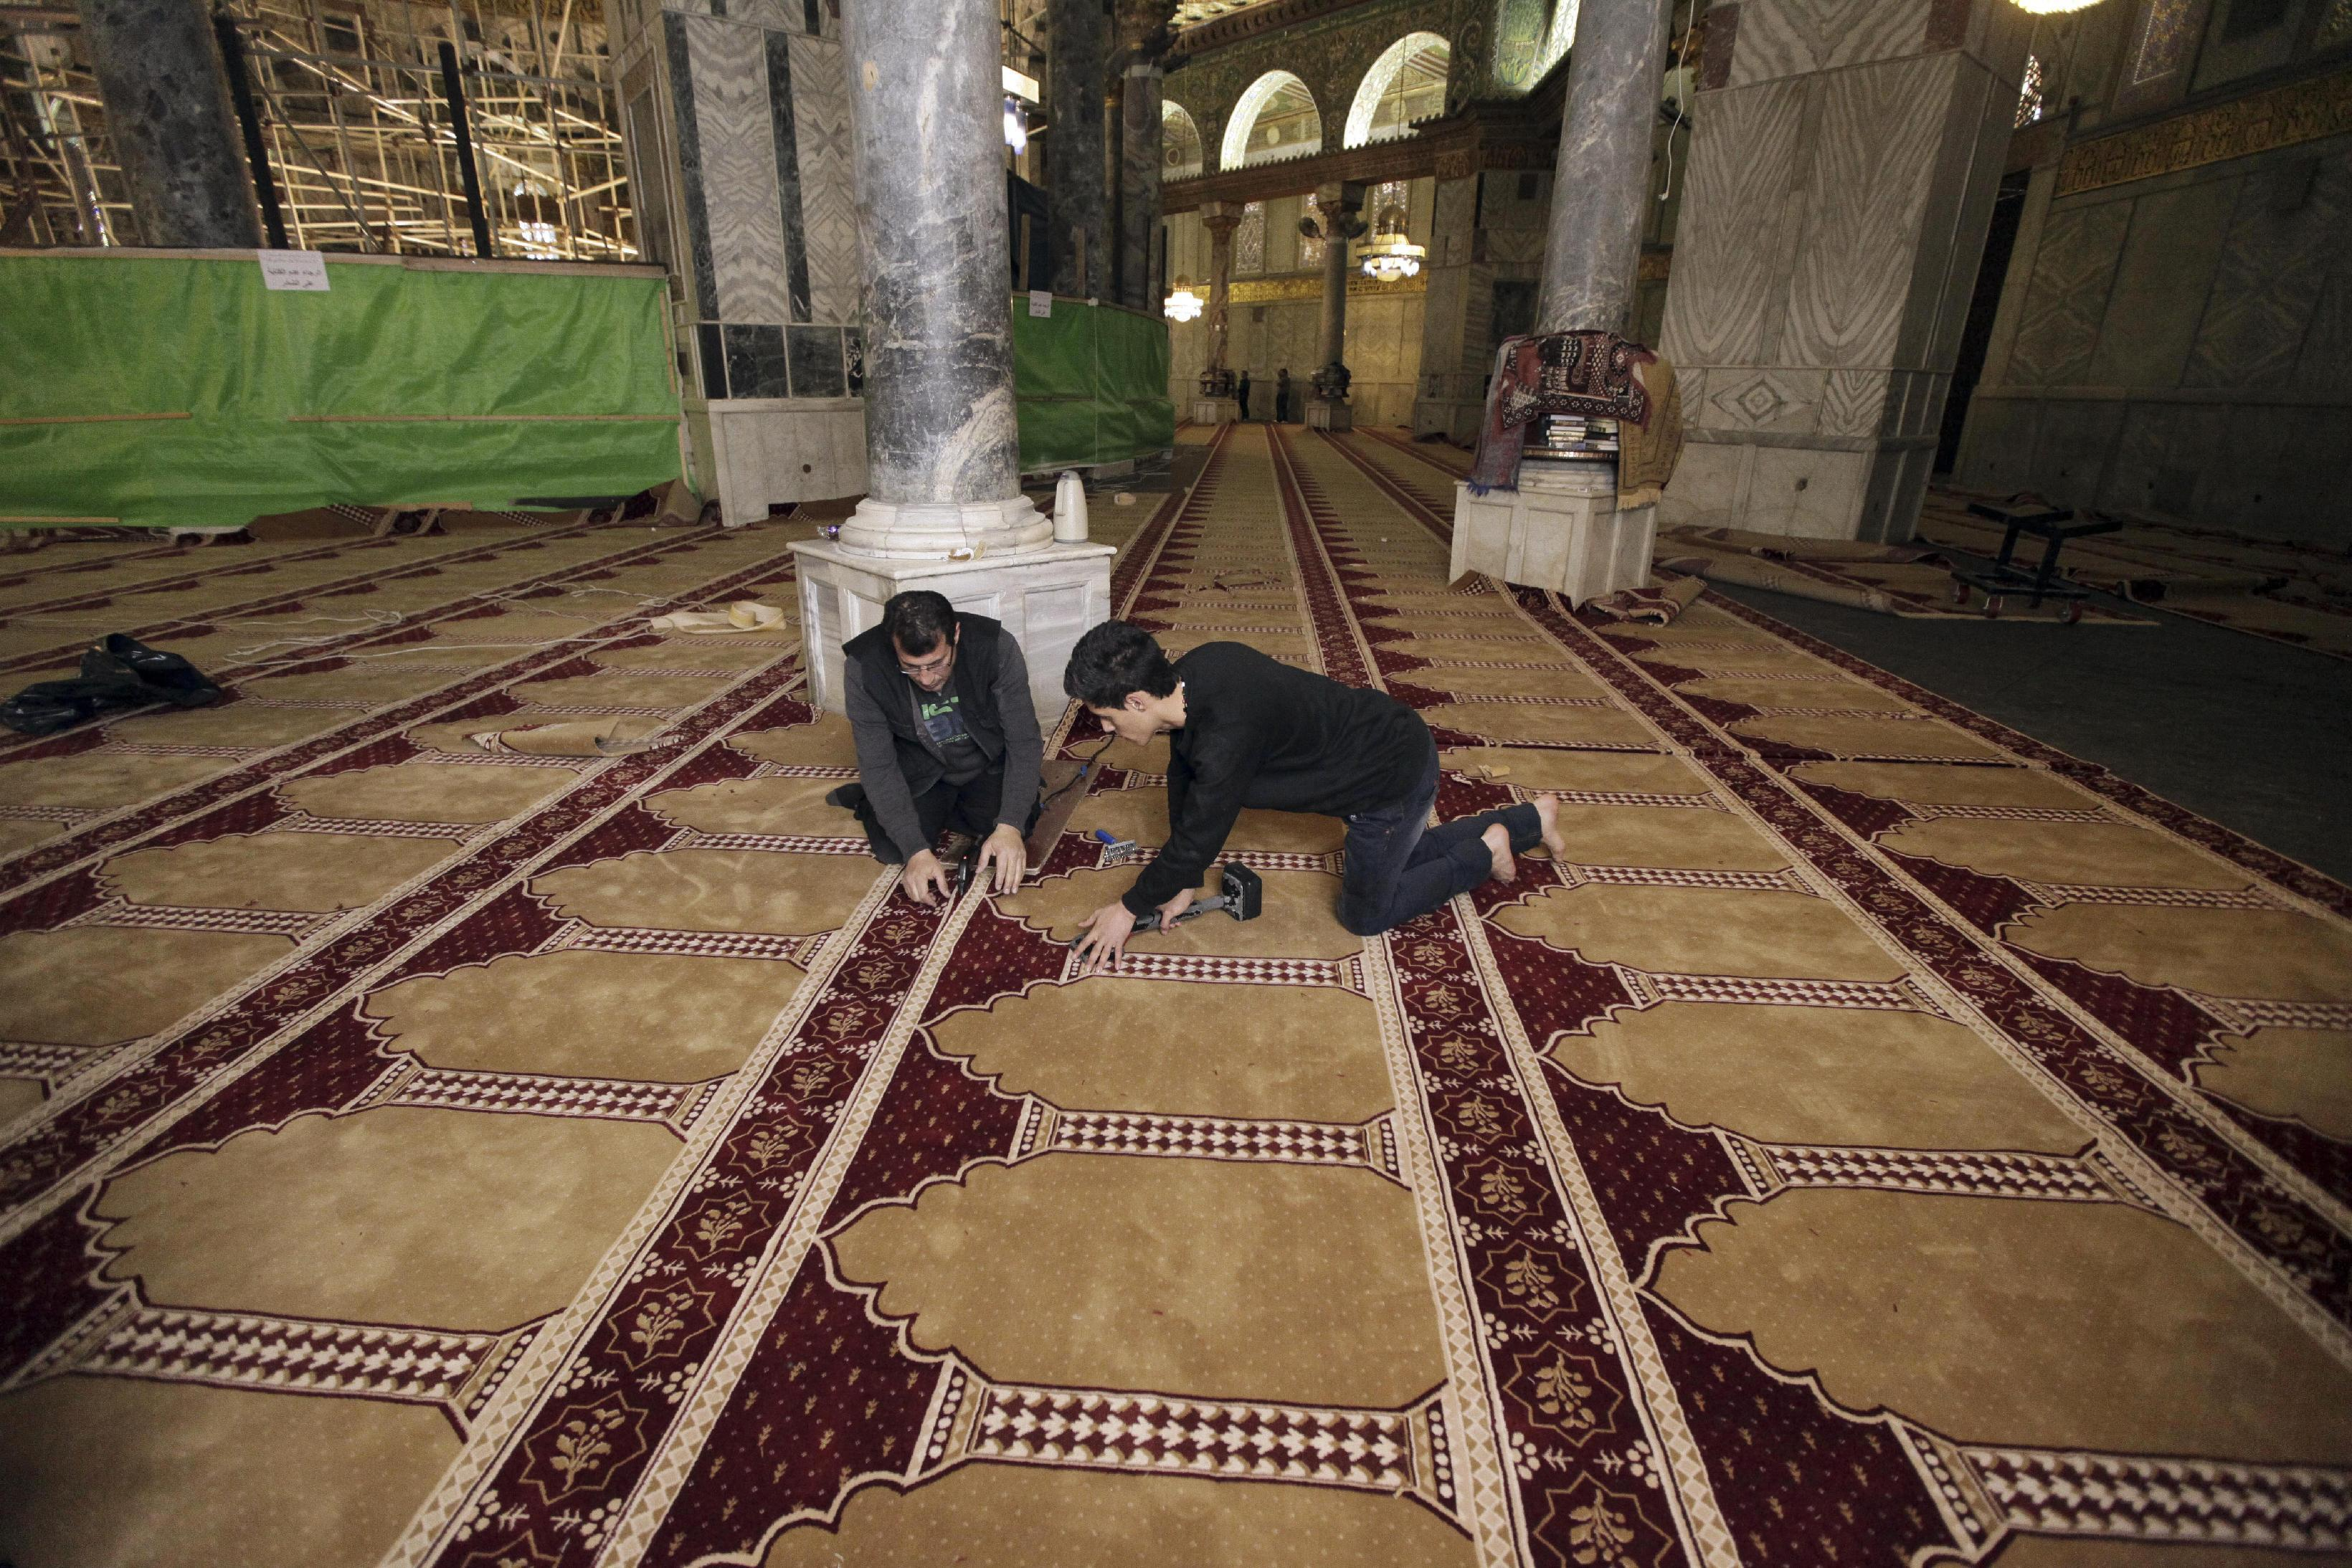 Replacing carpet at Jerusalem shrine reveals religious rift